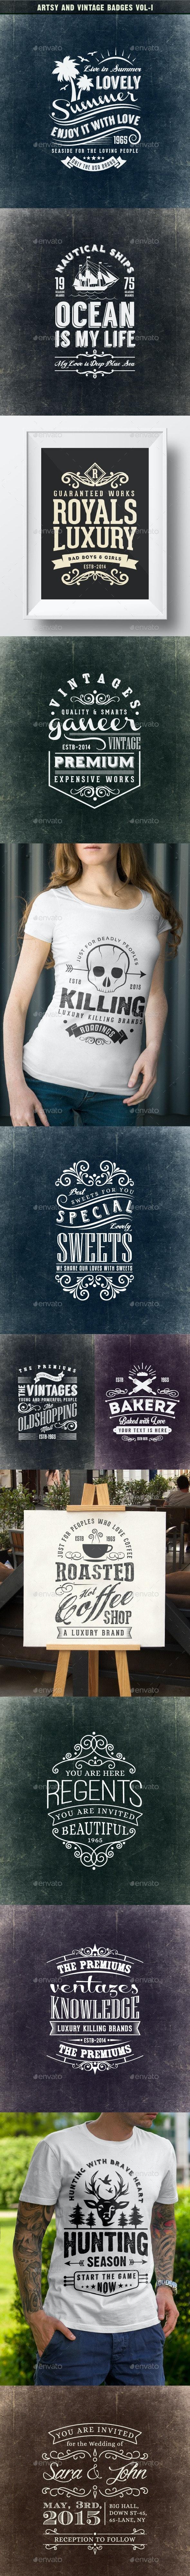 Artsy and Vintage Badges Vol-I - Badges & Stickers Web Elements